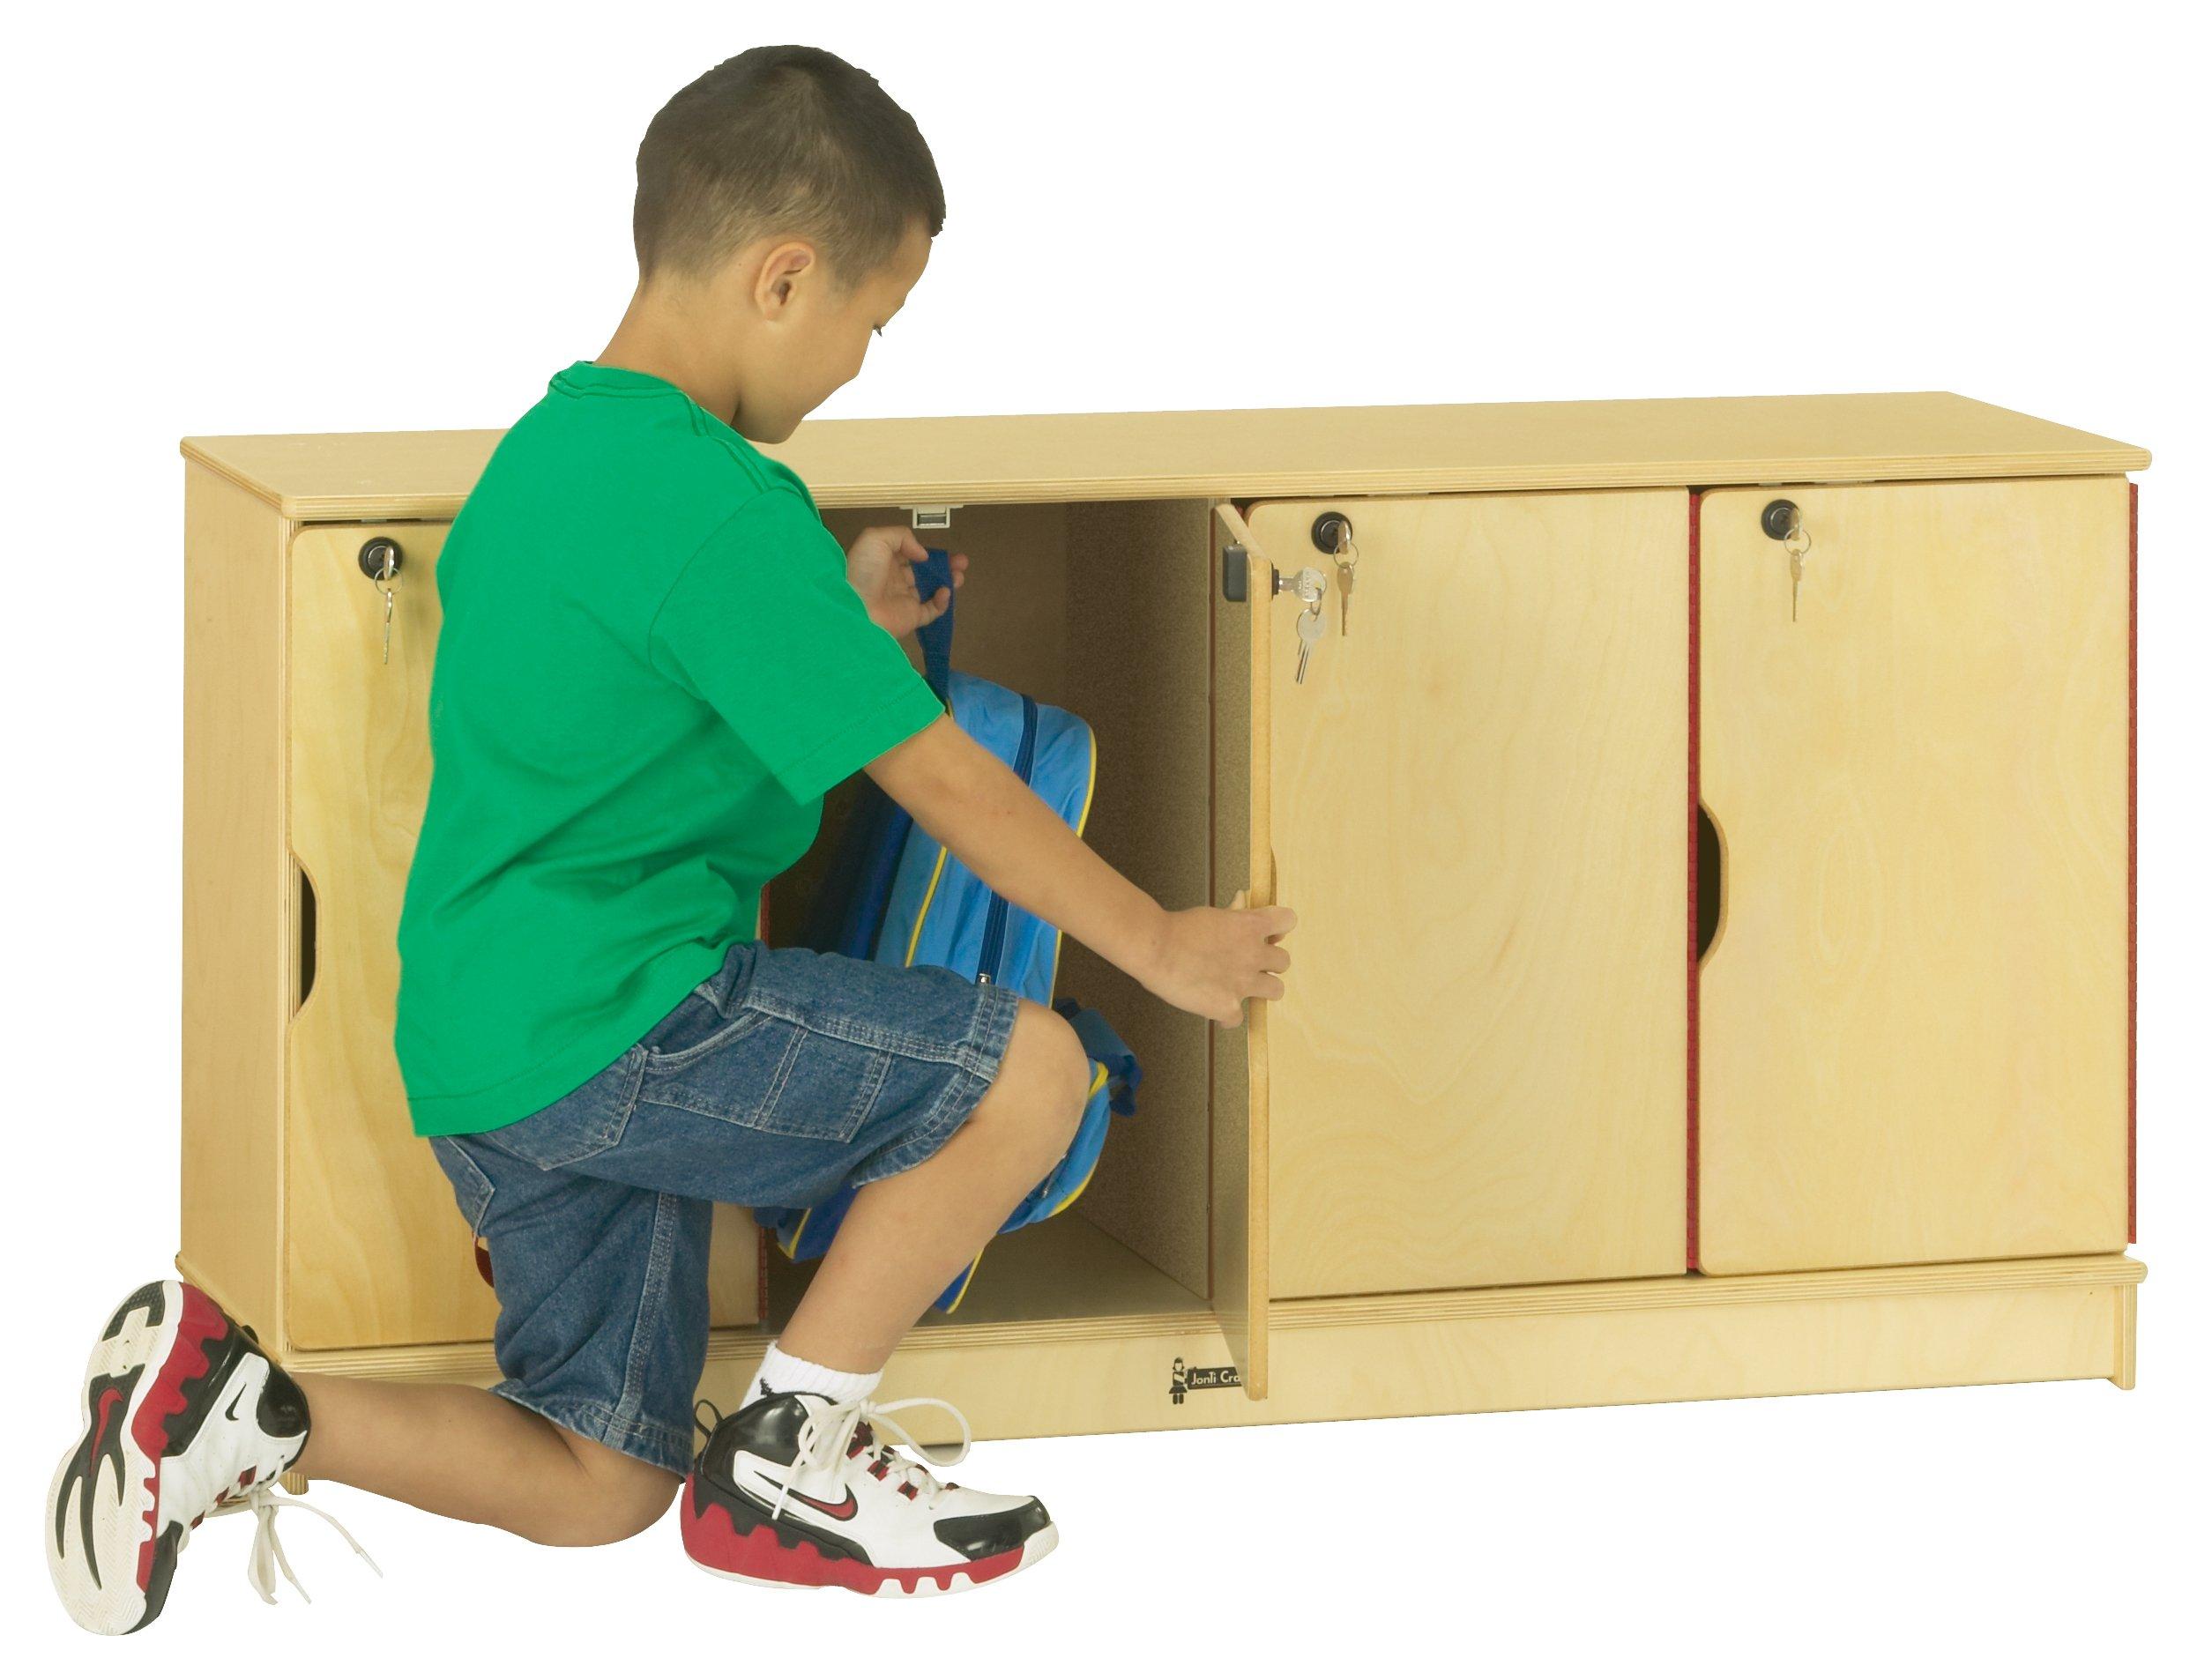 Jonti-Craft 4697TK Stacking Lockable Lockers, Triple Stack by Jonti-Craft (Image #2)